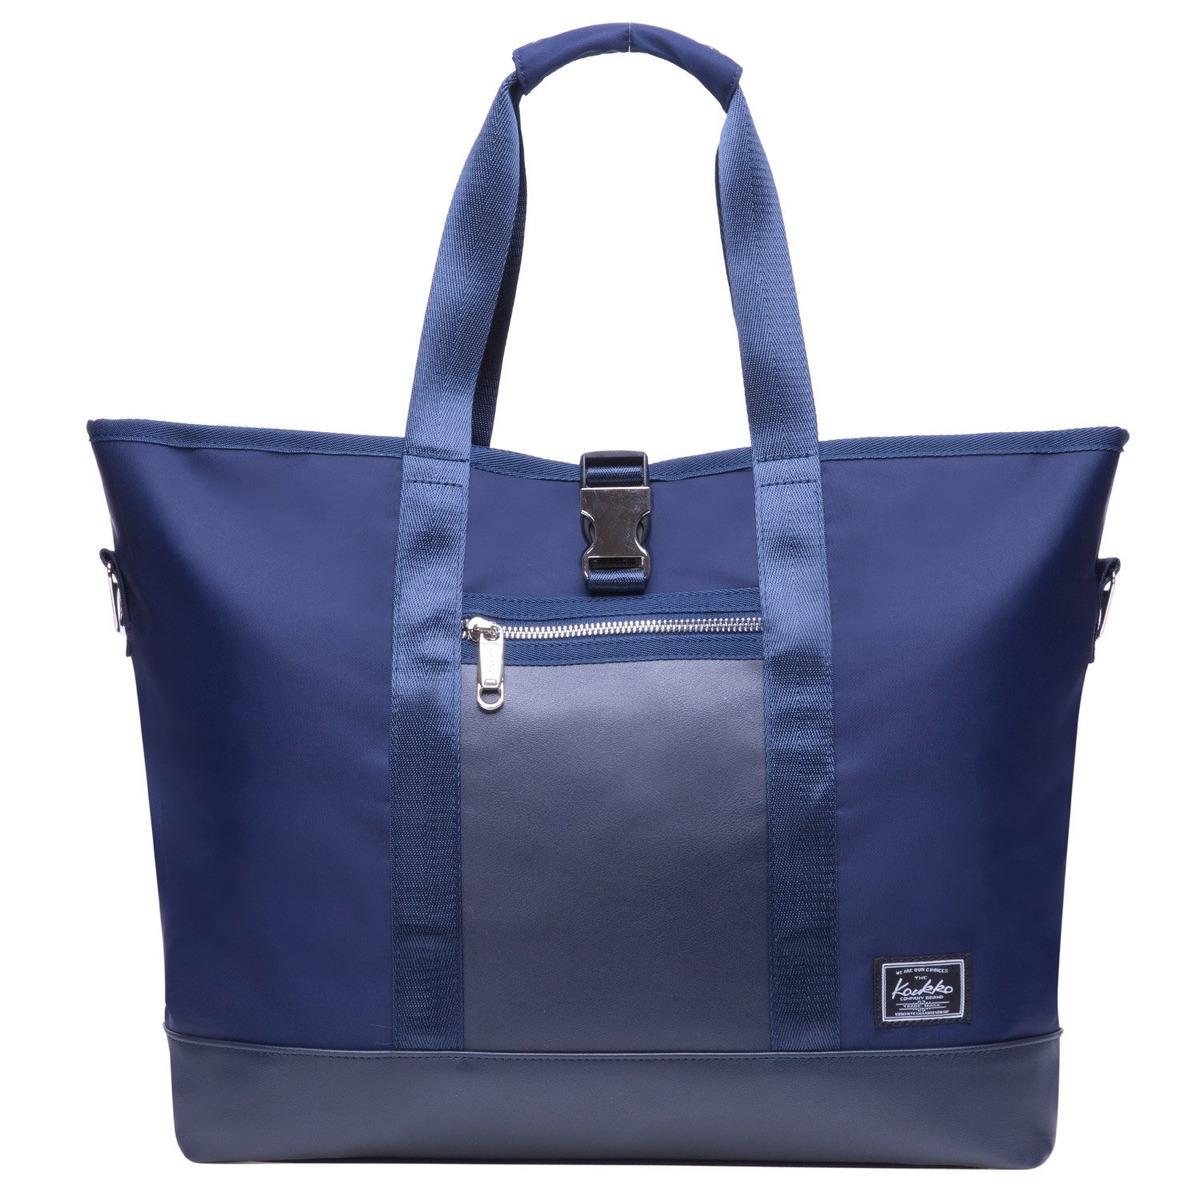 Kaukko Lightweight Handbag Travel Duffel Bags For Women M